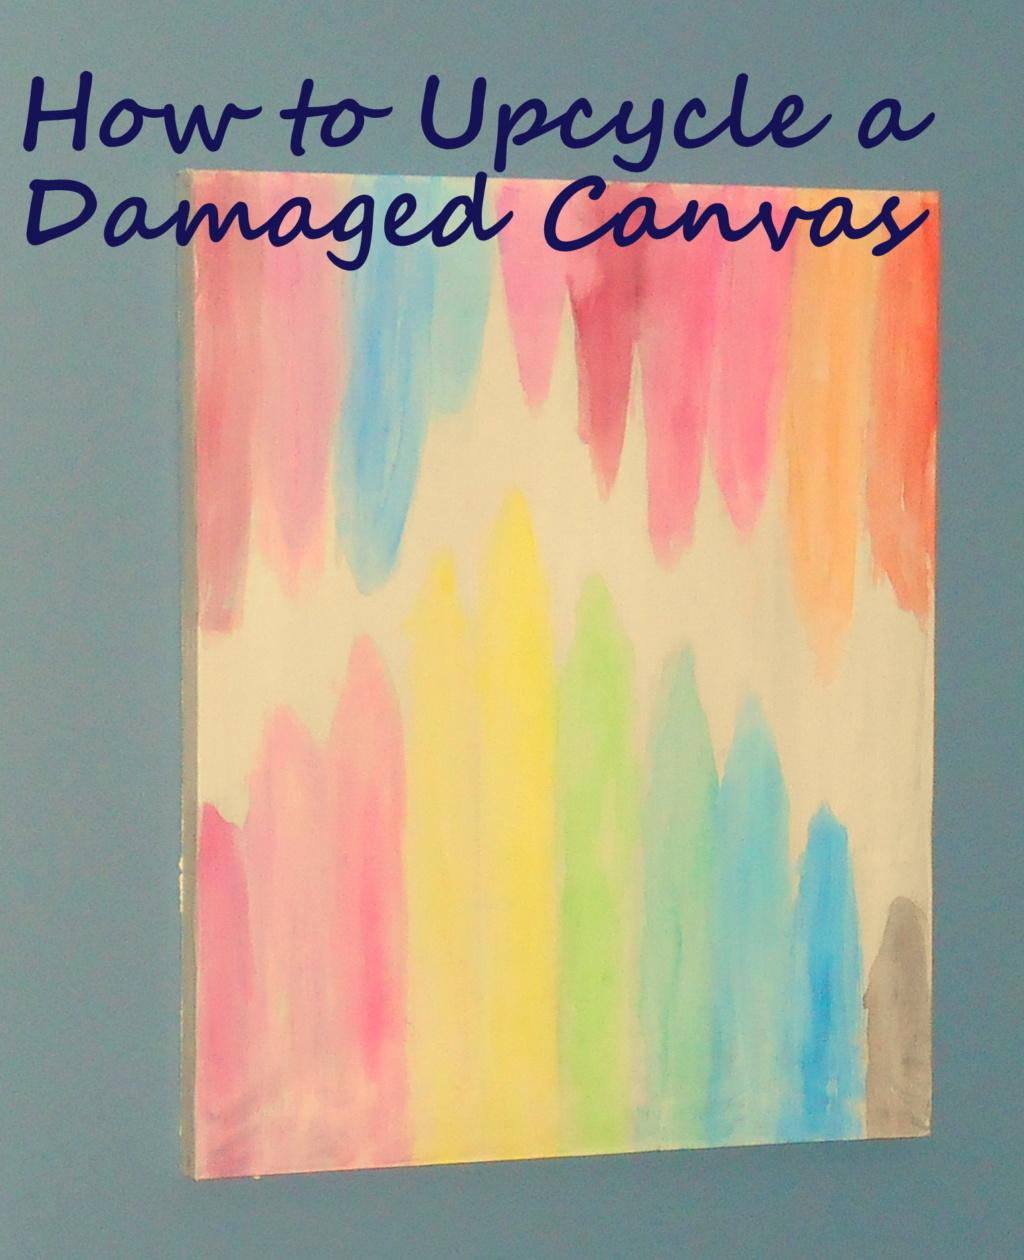 Repurposed, Upcycled, DIY, Watercolor, Canvas ART!